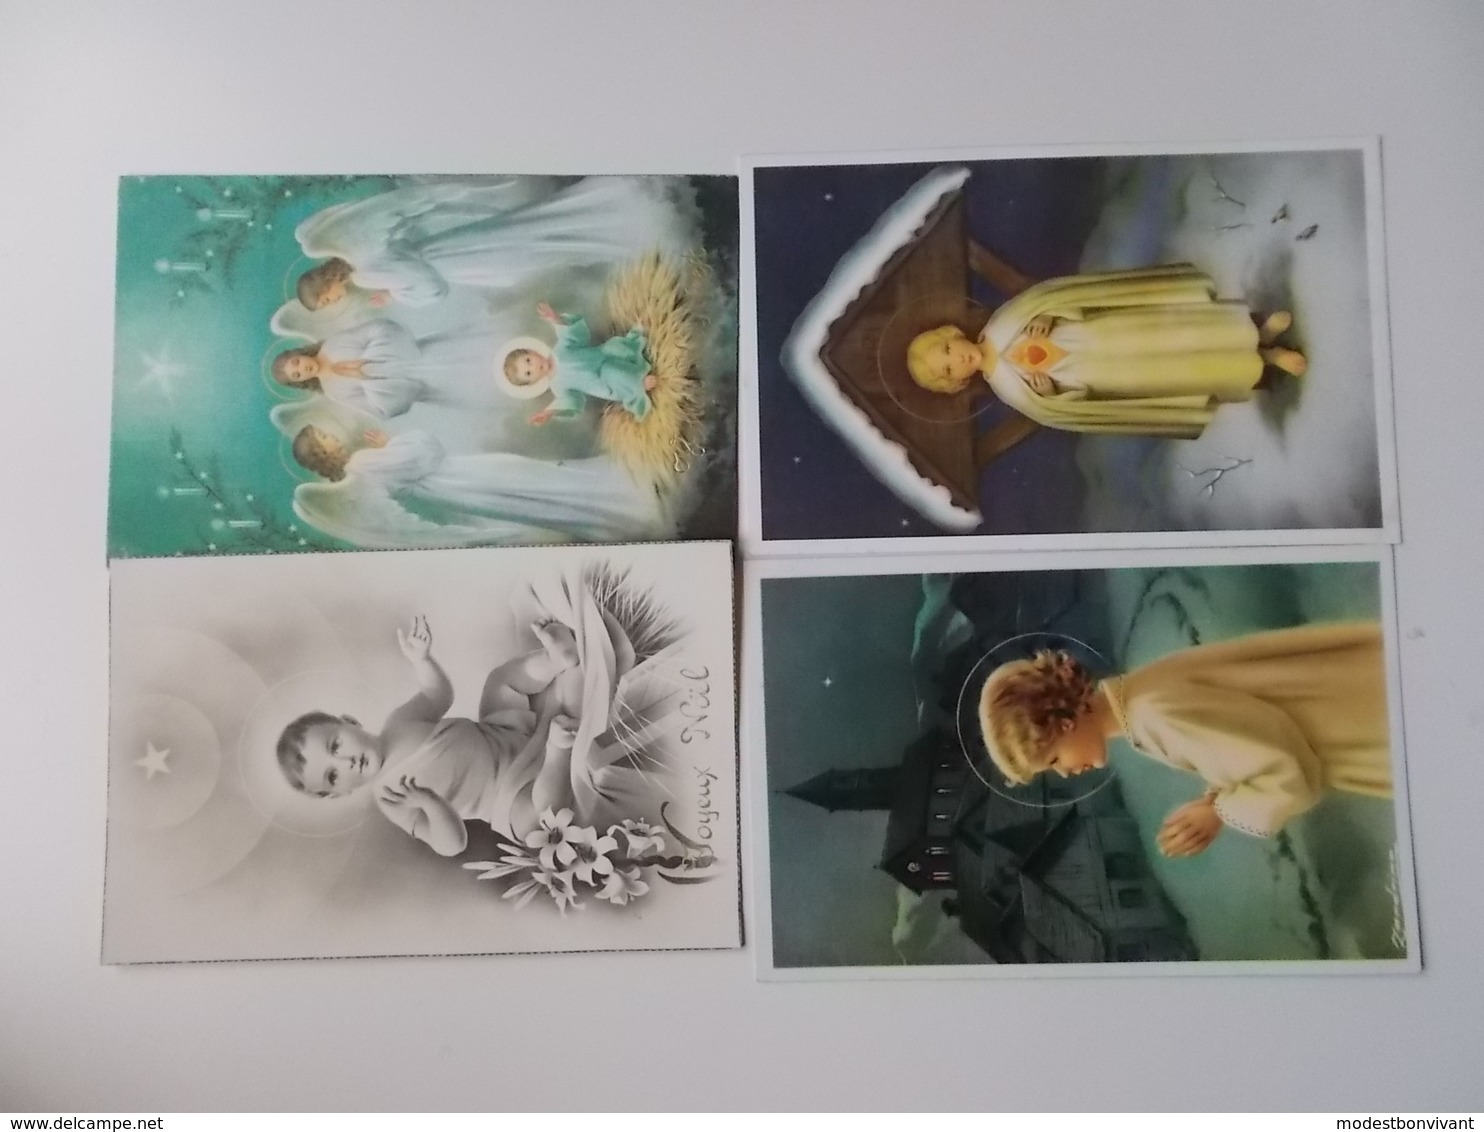 Lot 4 Vintage, Romantiek, Amitiès, Liefde, Amour, Begin 1900, Folklore, Wensen, Bloemen,  JOYEUX NOËL./ KERST.... # 13 - Phantasie